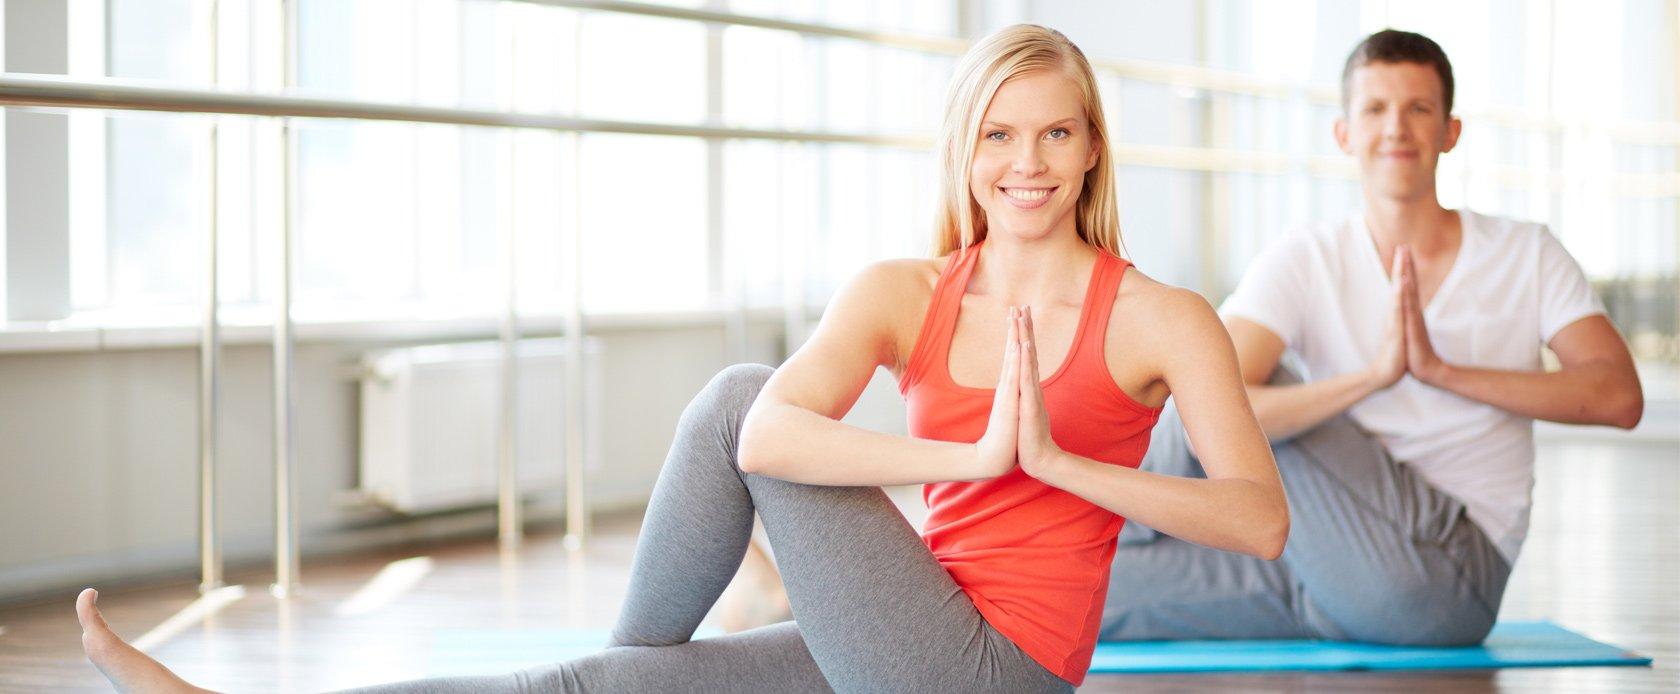 bikram-yoga-con-calefaccion-por-infraqrrojos